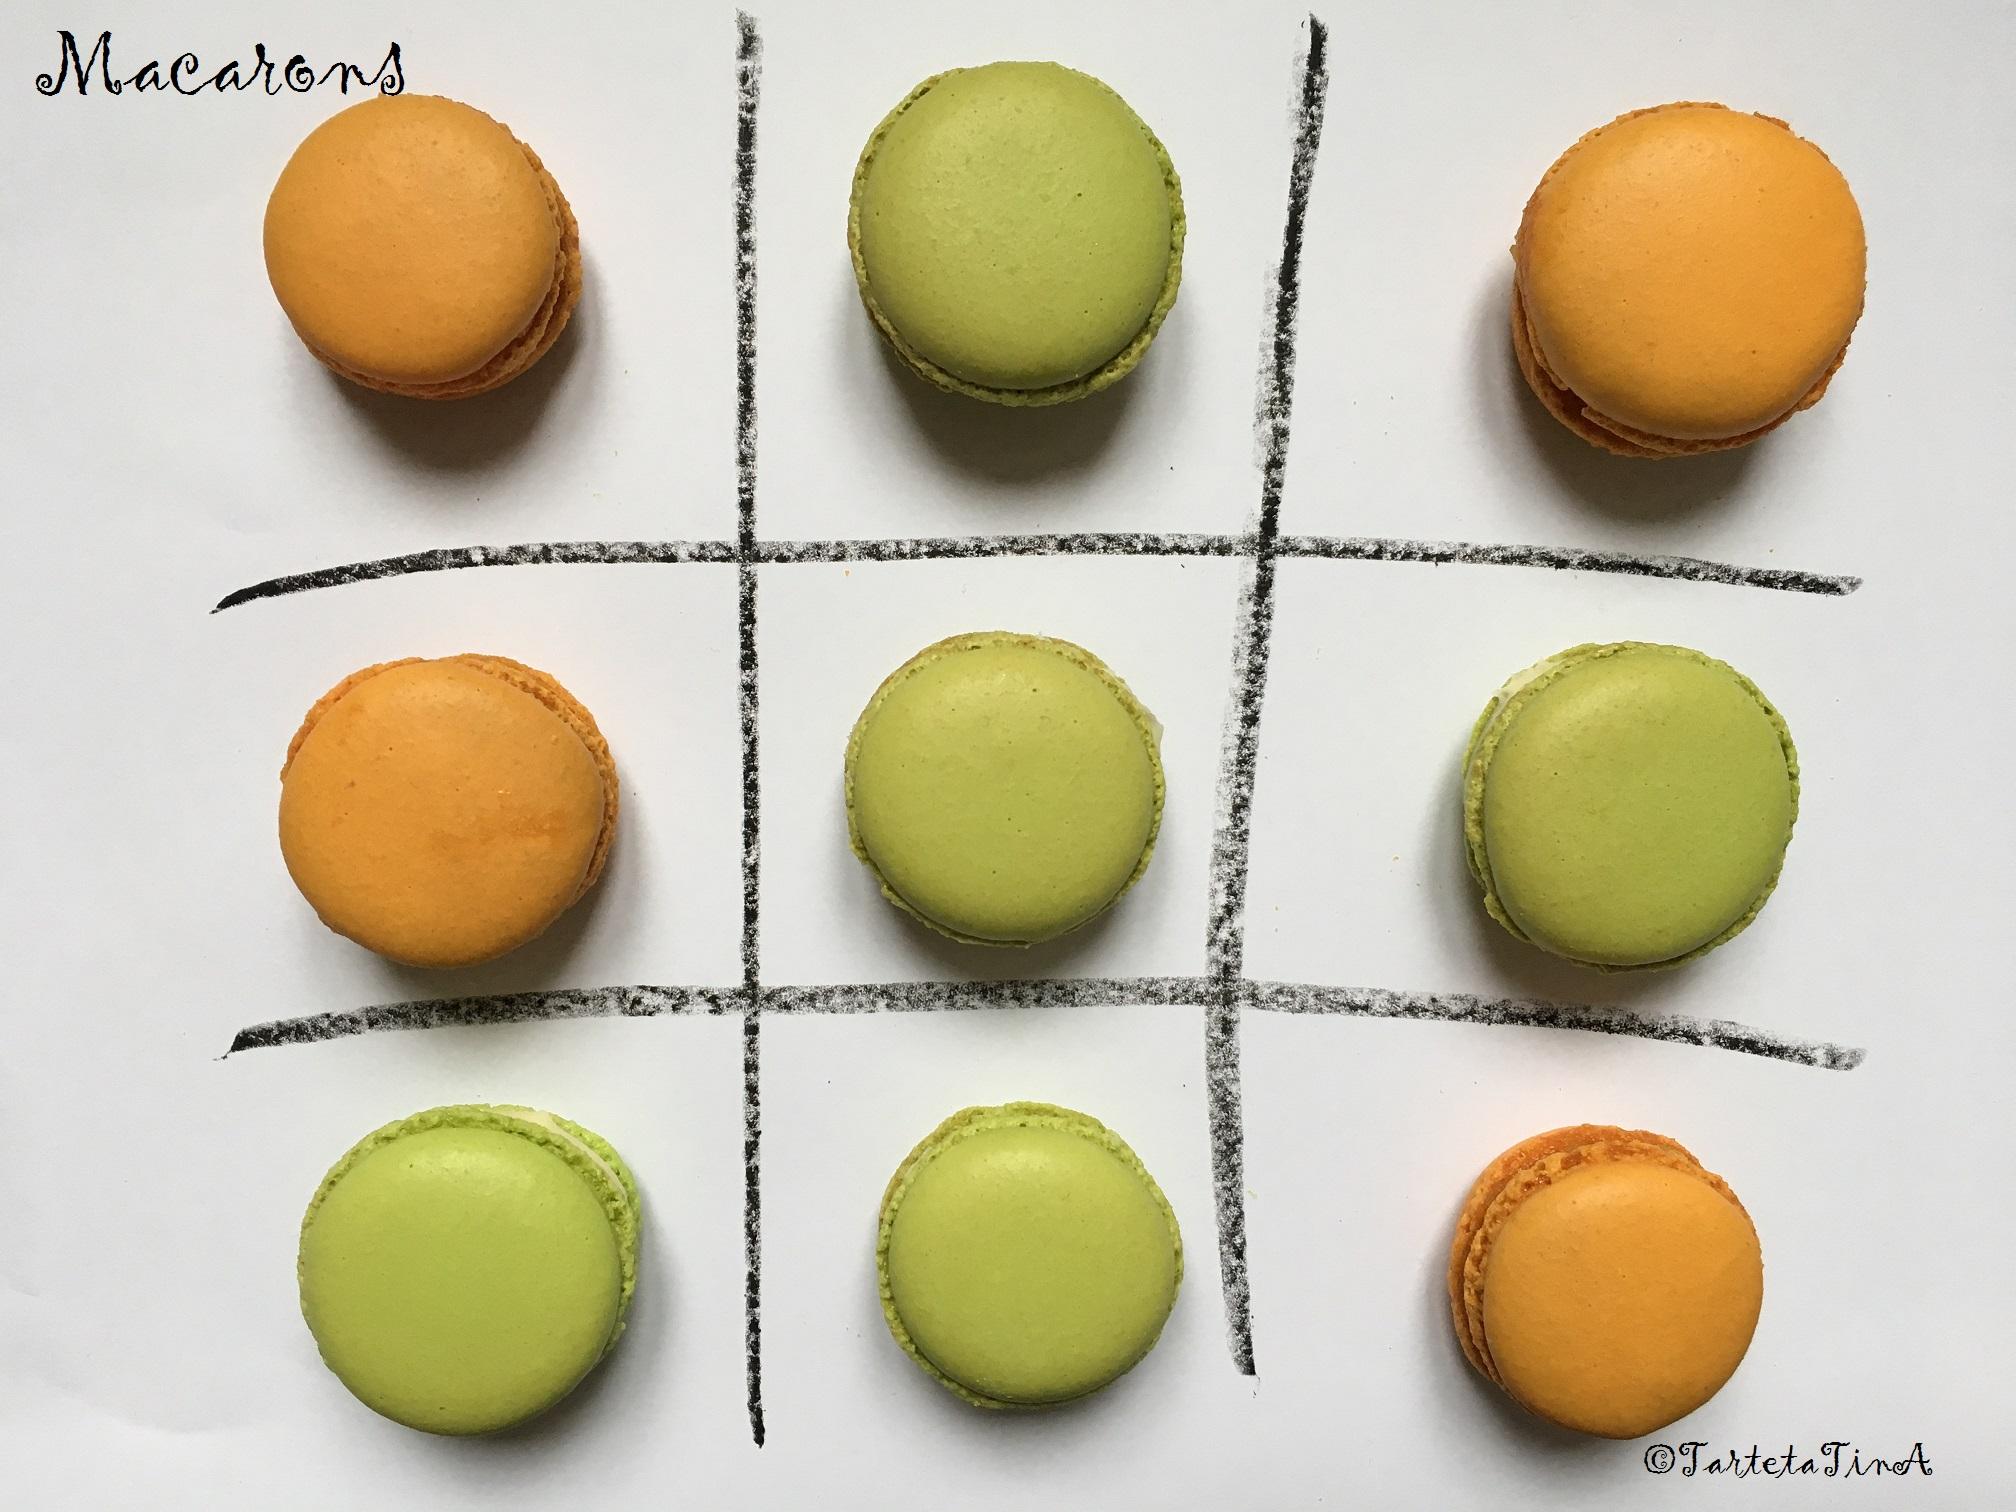 I macarons arancia zenzero e zafferano,ananas cioccolato e rosmarino